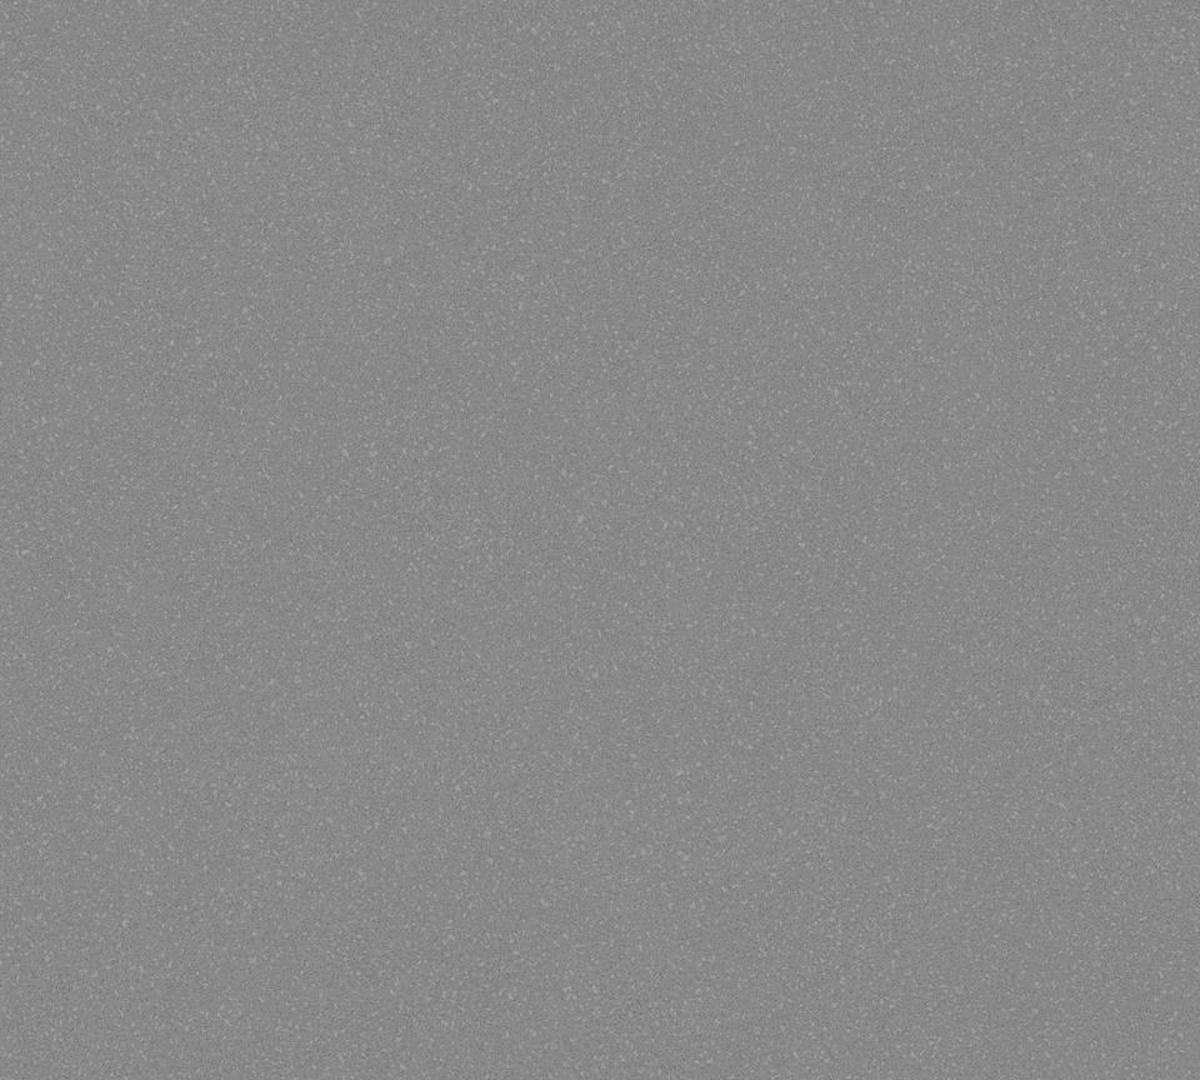 Линолеум Tarkett ACCZENT PRO Aspect 3 ACP2000706 (2 мм, 0,7 защита) шир. рул. 2;3м, КМ2